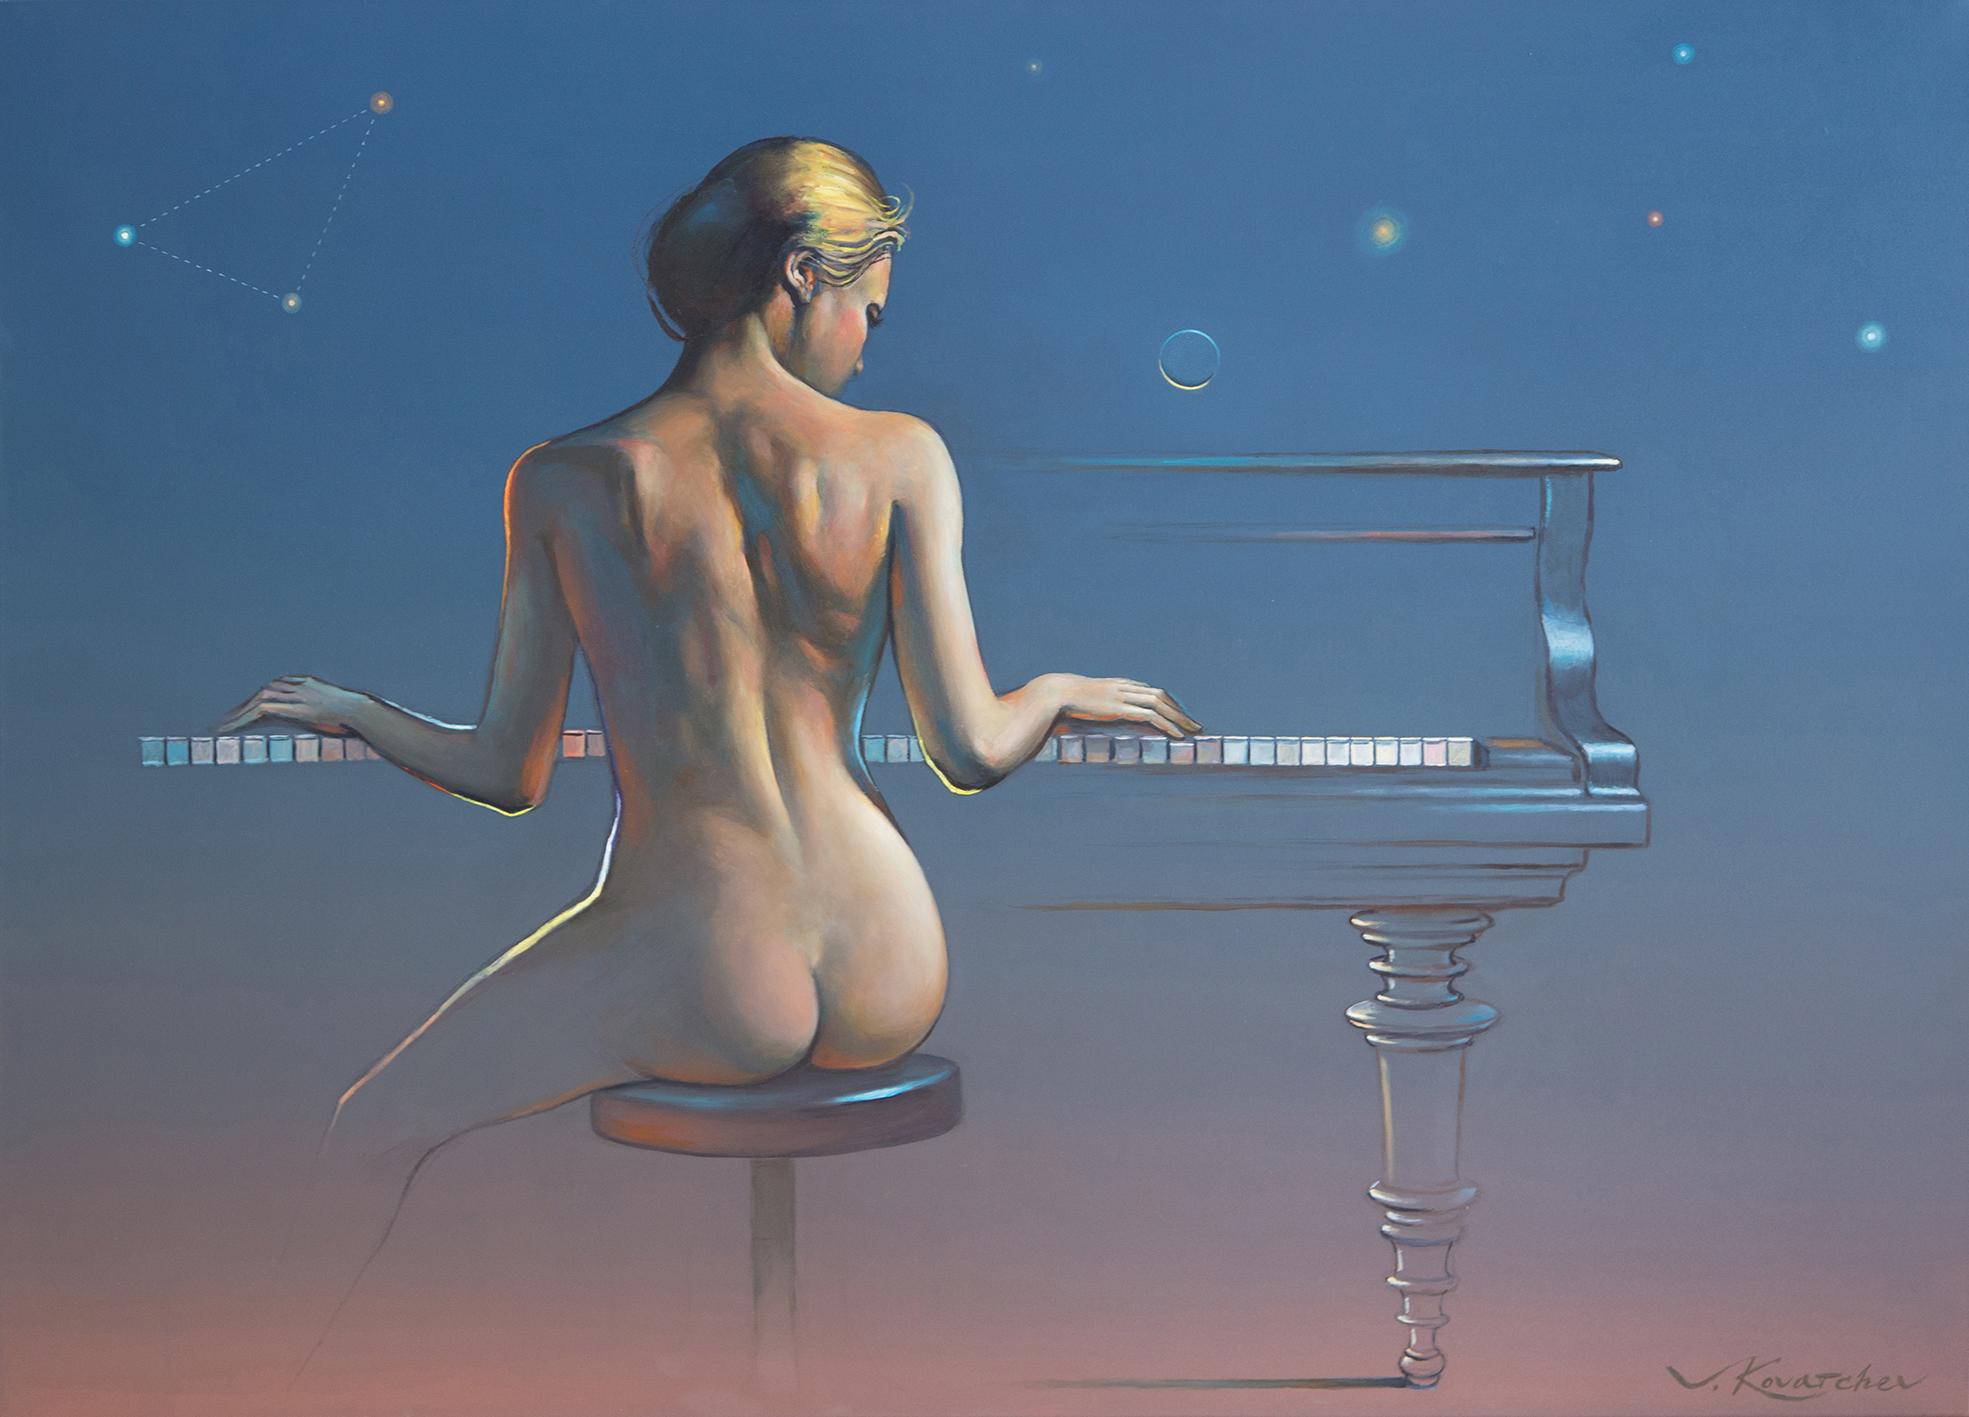 Pianista azul. 97 x 130 cm.jpg